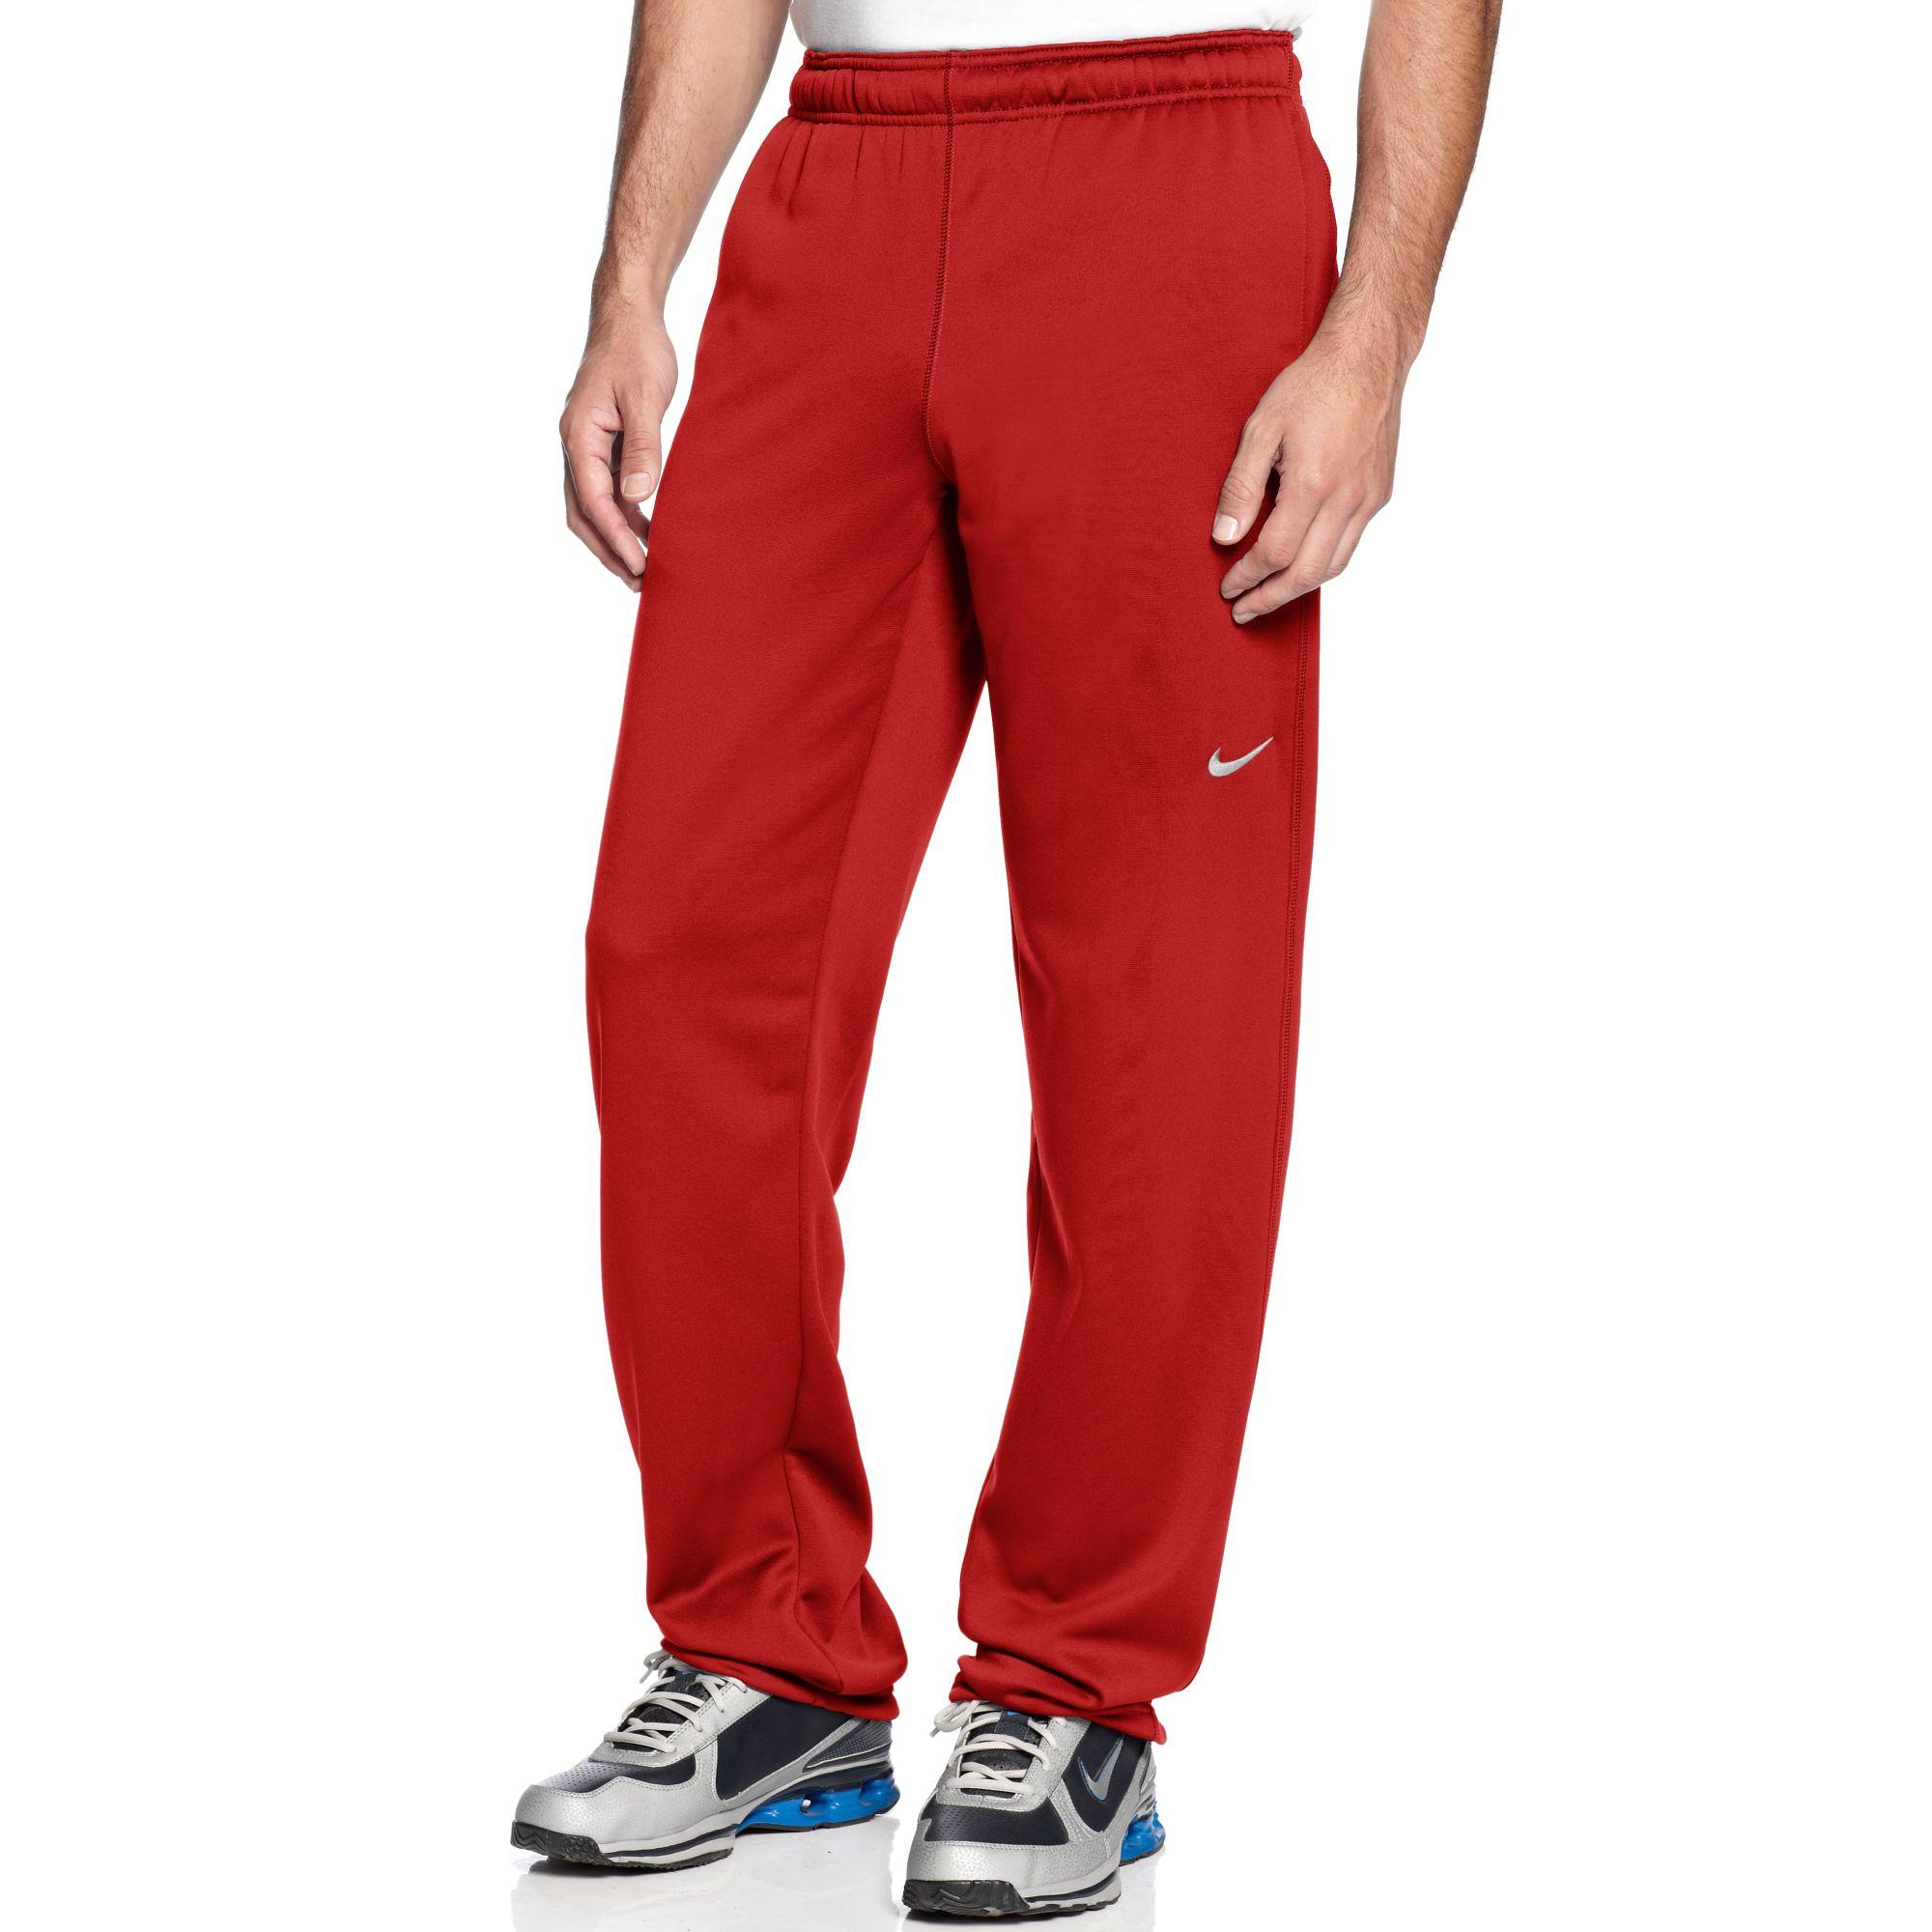 8b6319f7c570 Nike Pants Red unit4motors.co.uk